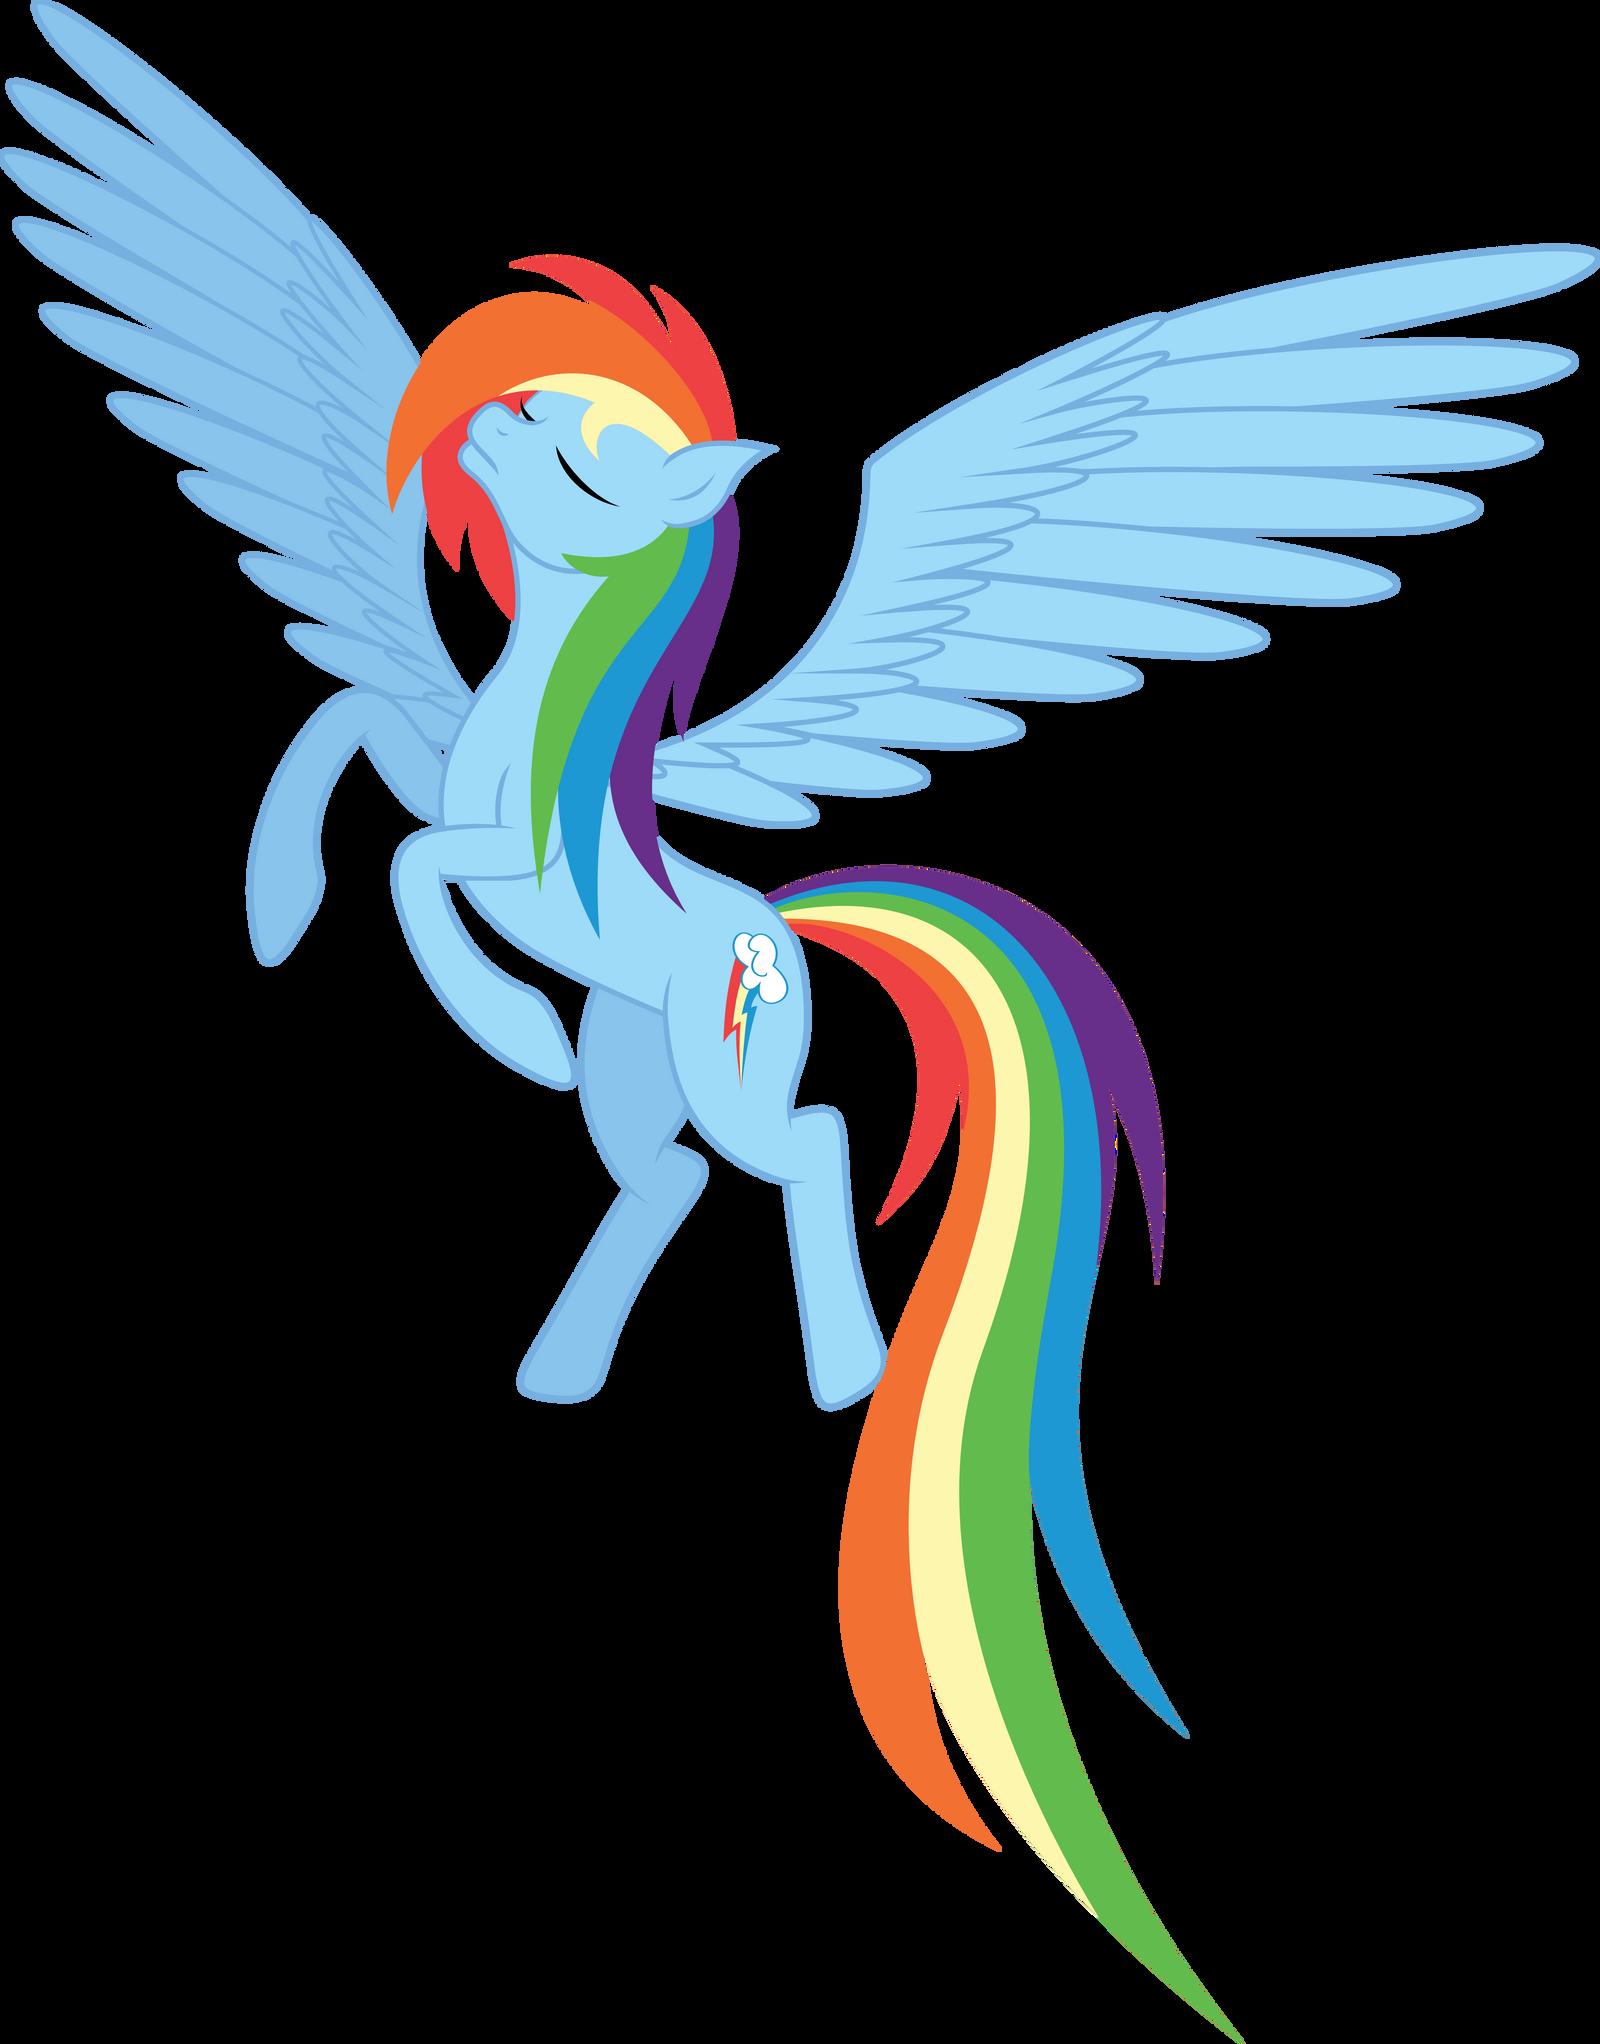 Rainbow by xPesifeindx